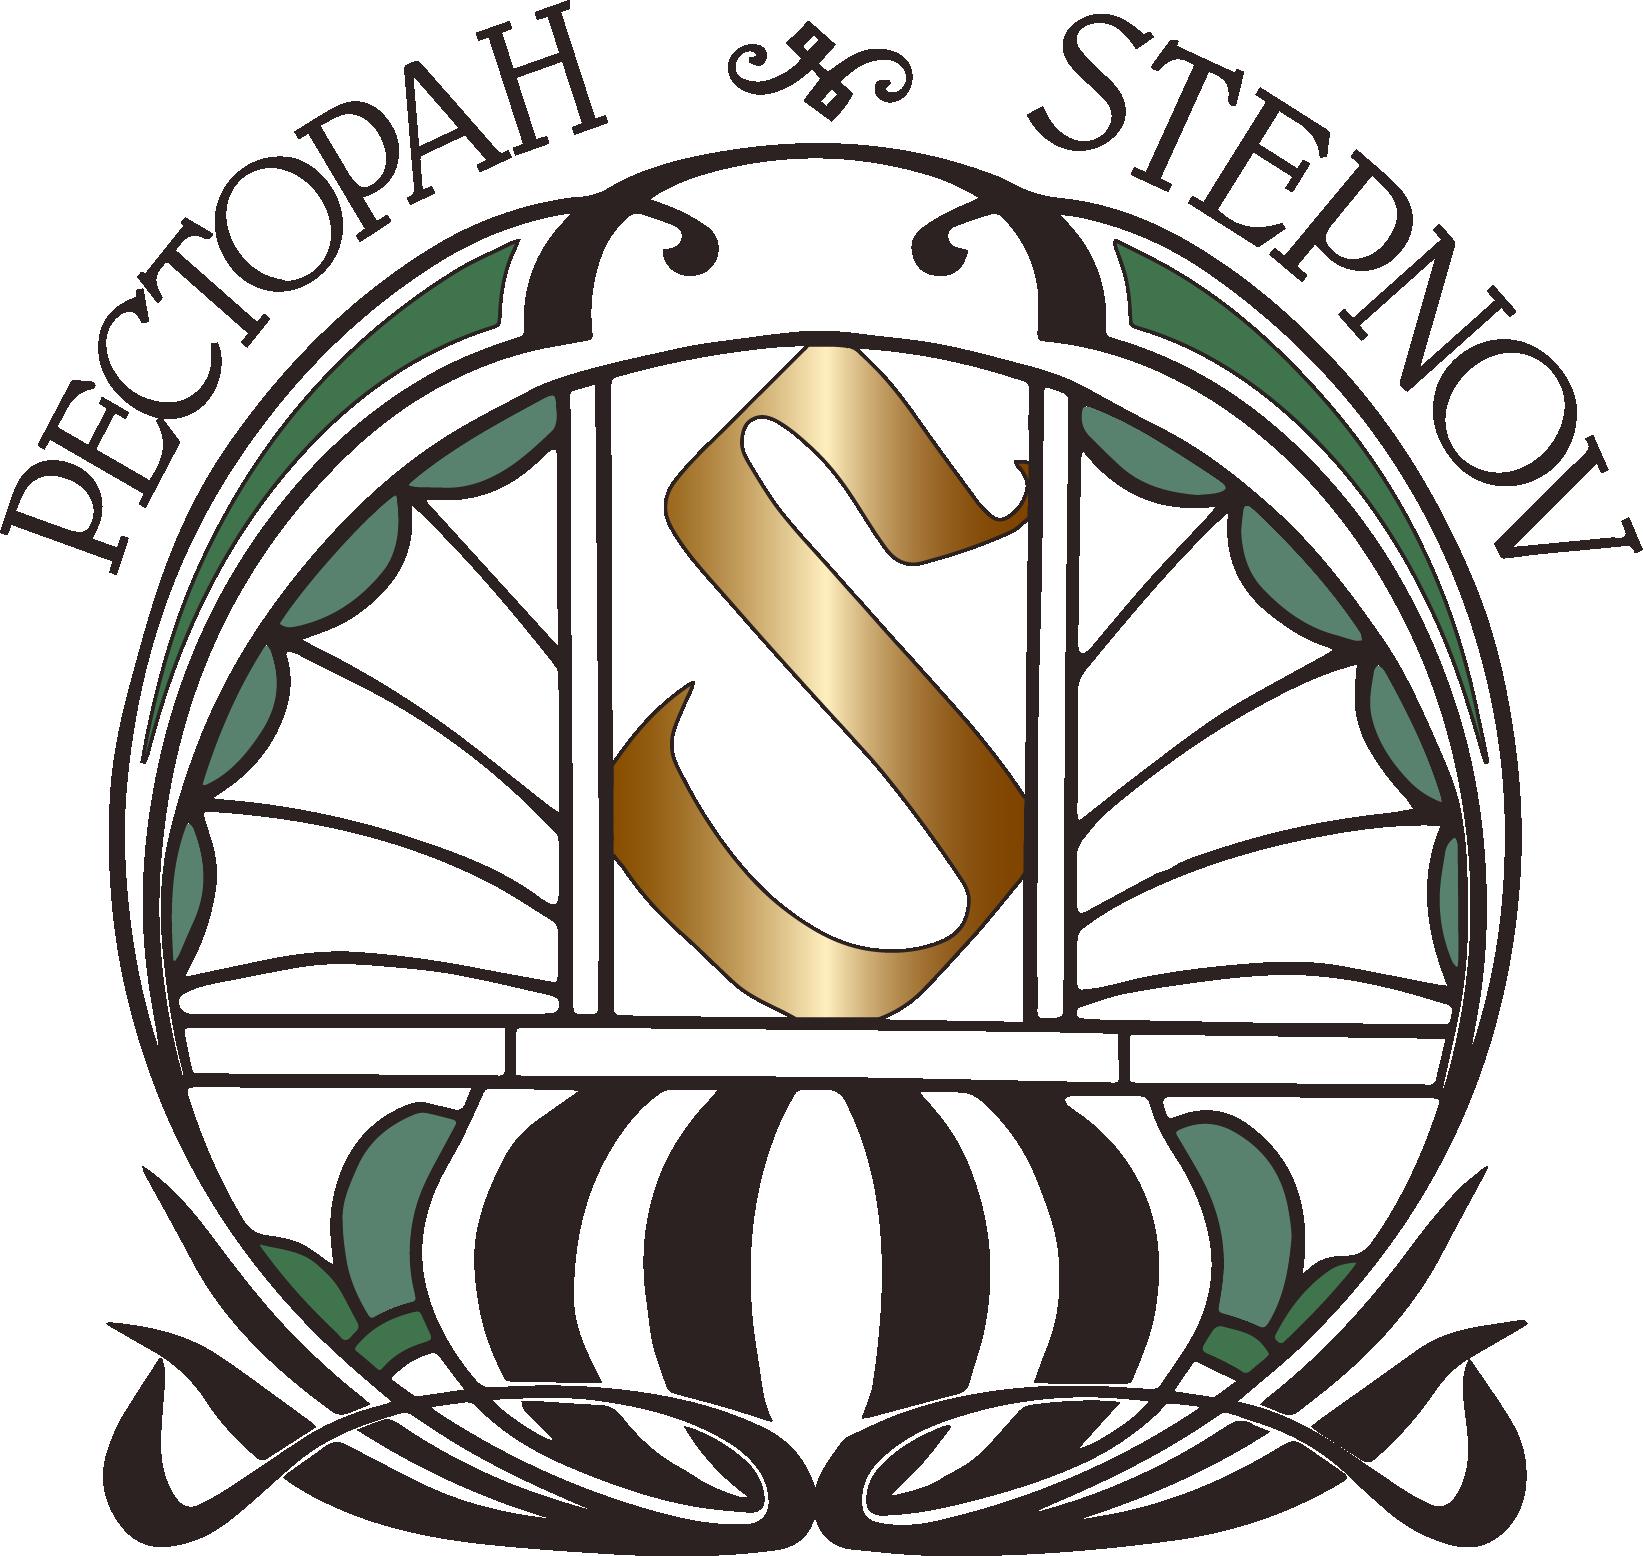 STEPNOV